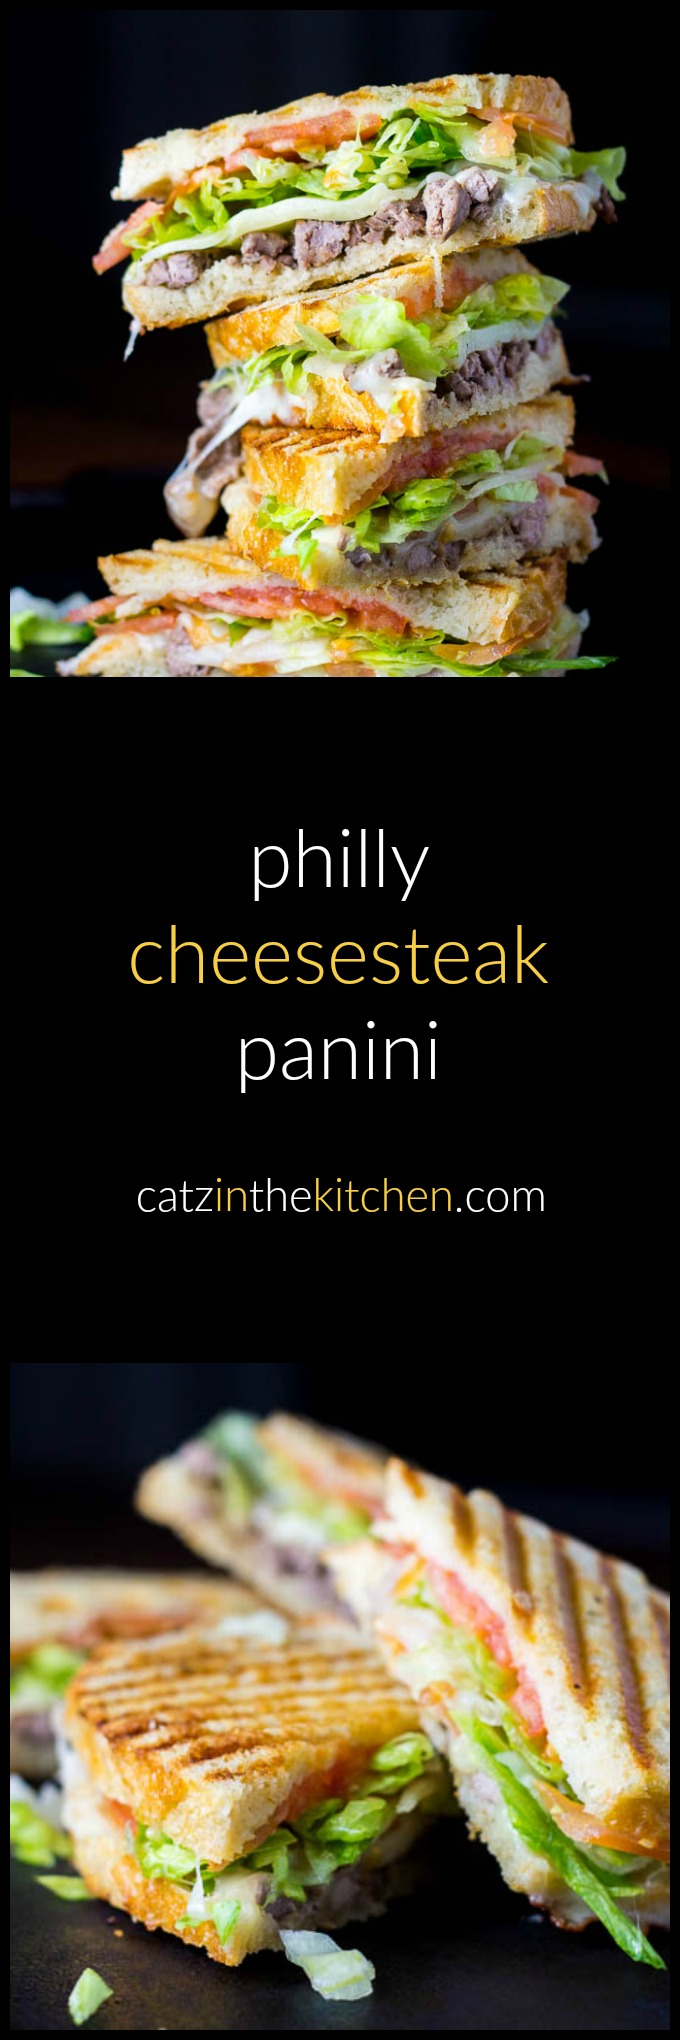 Philly Cheesesteak Panini   Catz in the Kitchen   catzinthekitchen.com   #philly #cheesesteak #panini #recipe